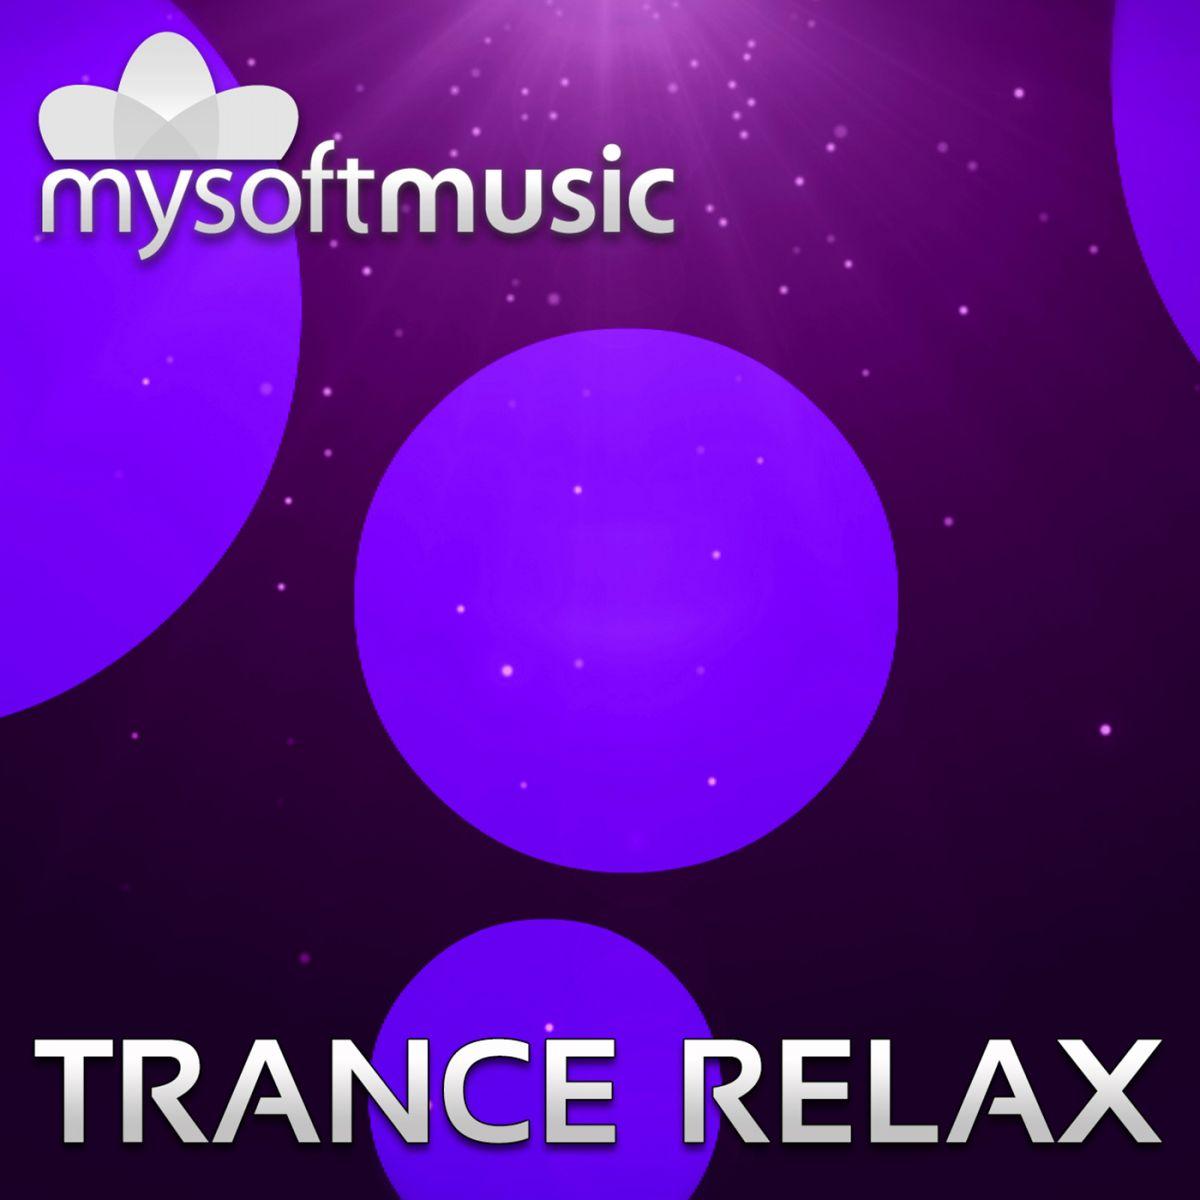 Trance Relax music download mp3 | mysoftmusic